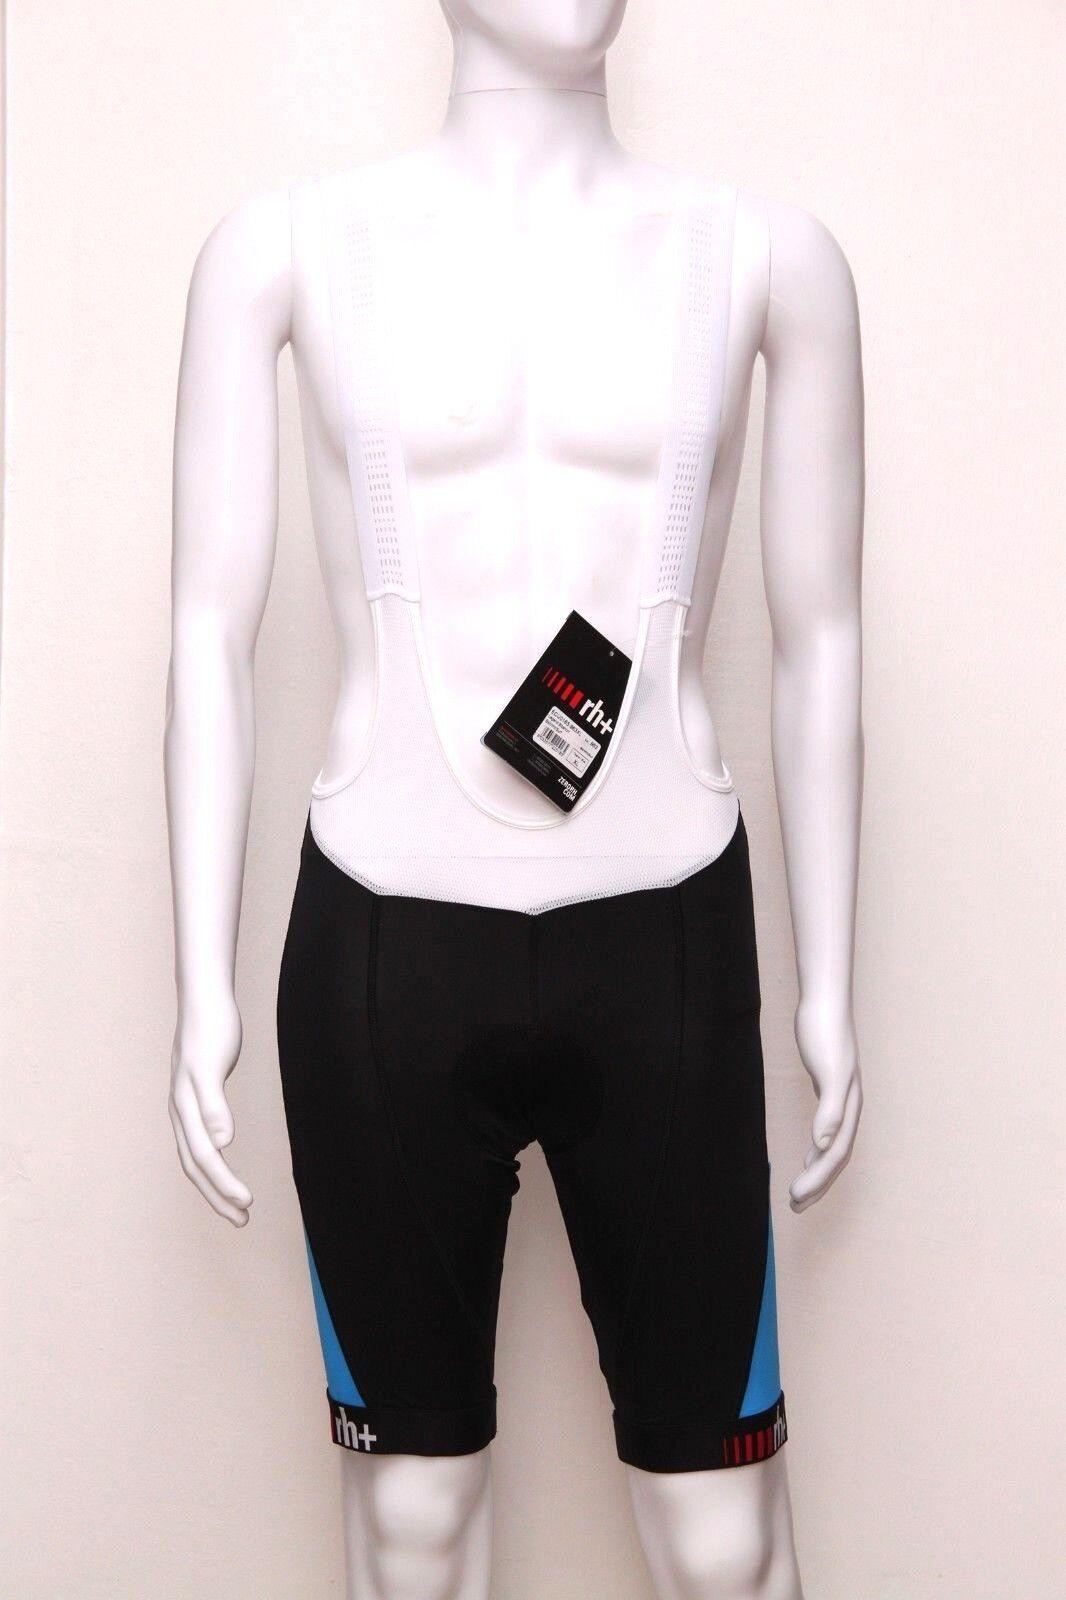 Zero Rh + señores bicicleta portador pantalones Legend bibshorts, negro blanco azul surf, XXL